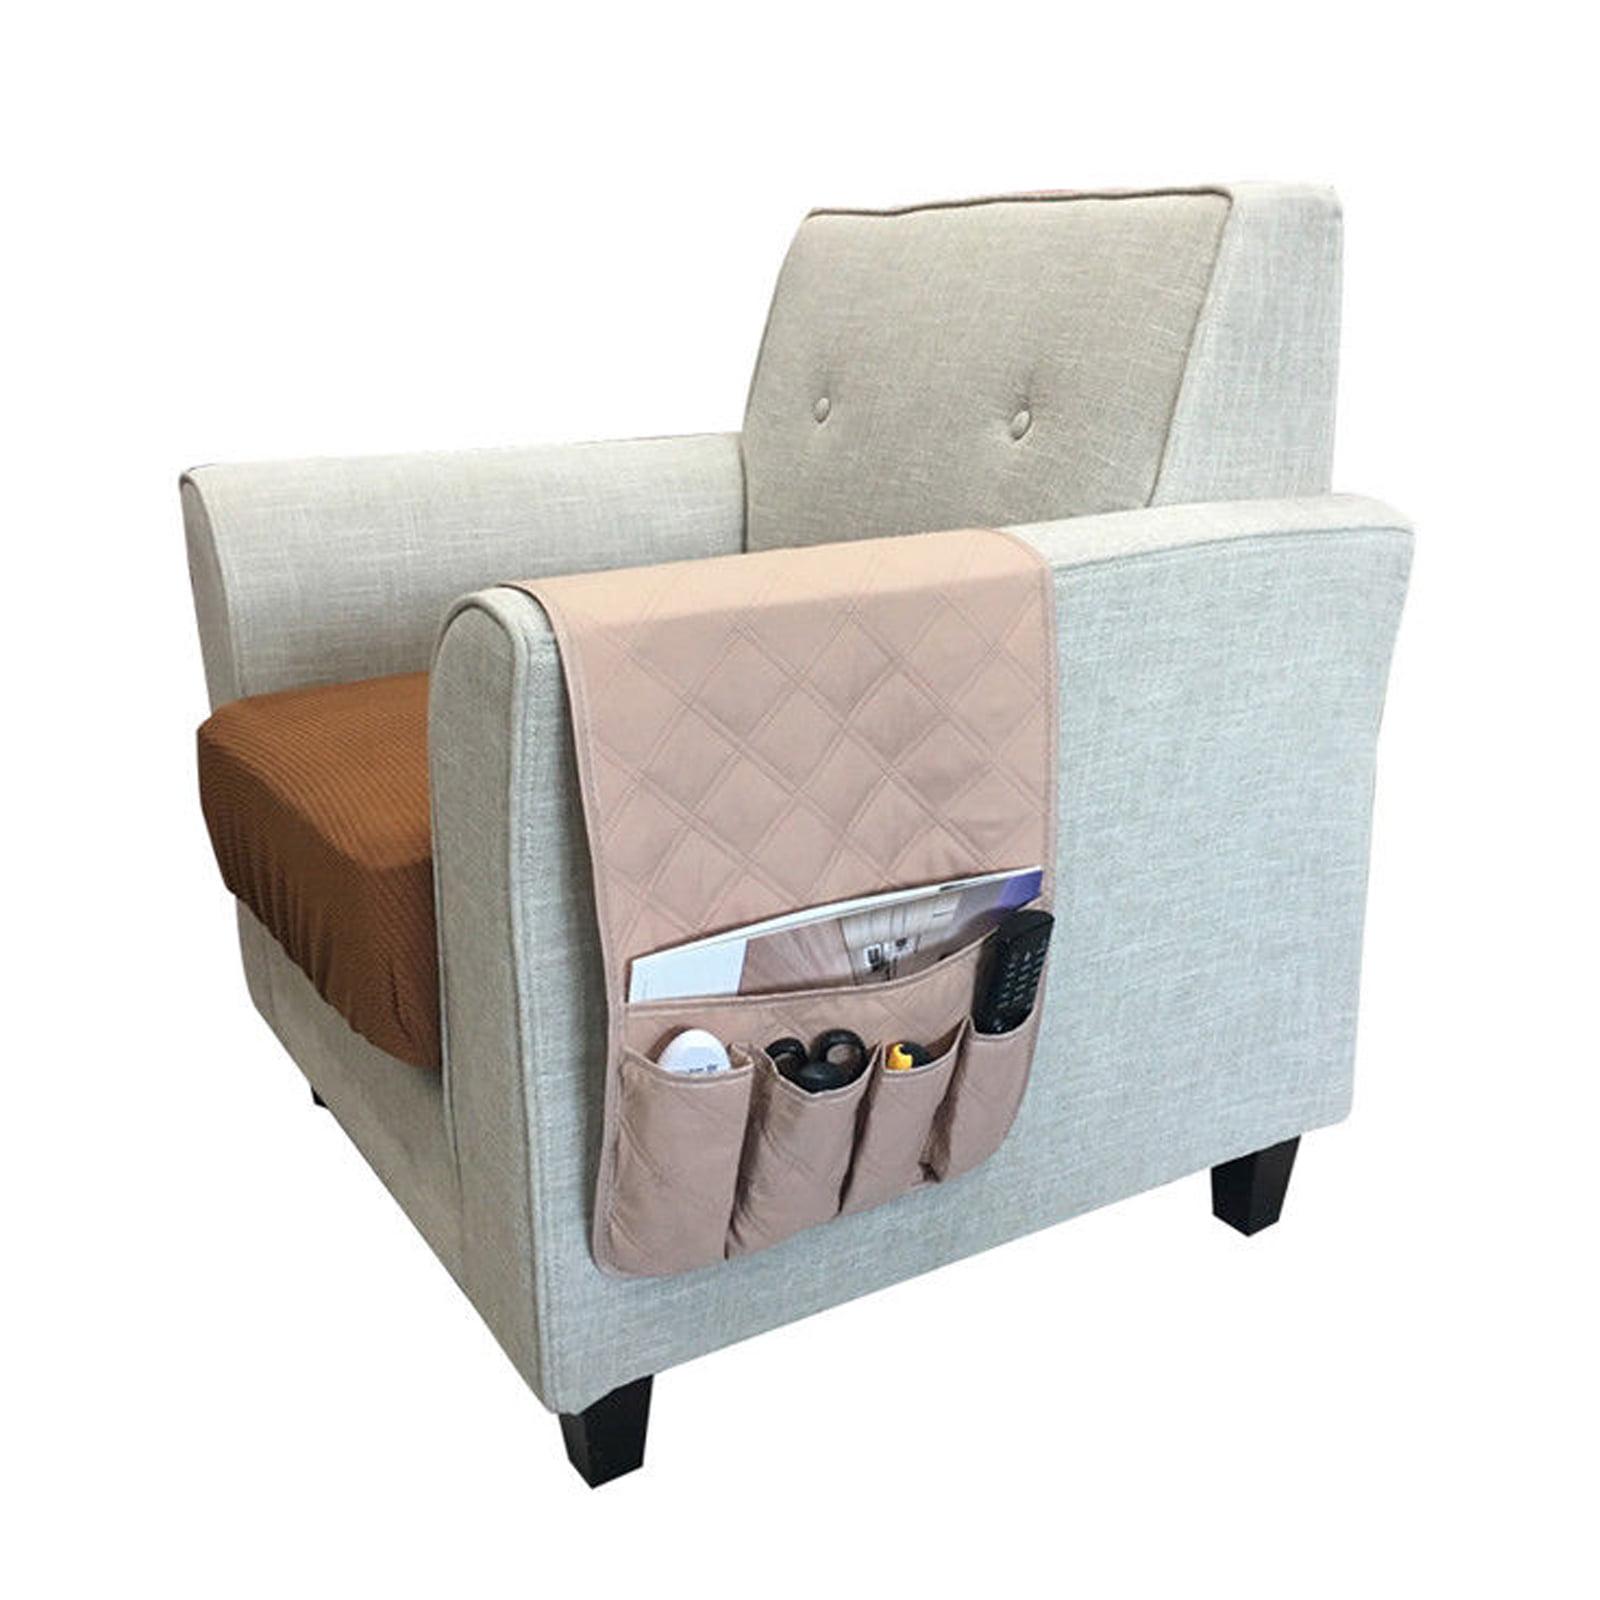 Couch Sofa Chair Armrest Remote Control Storage Organizer ...